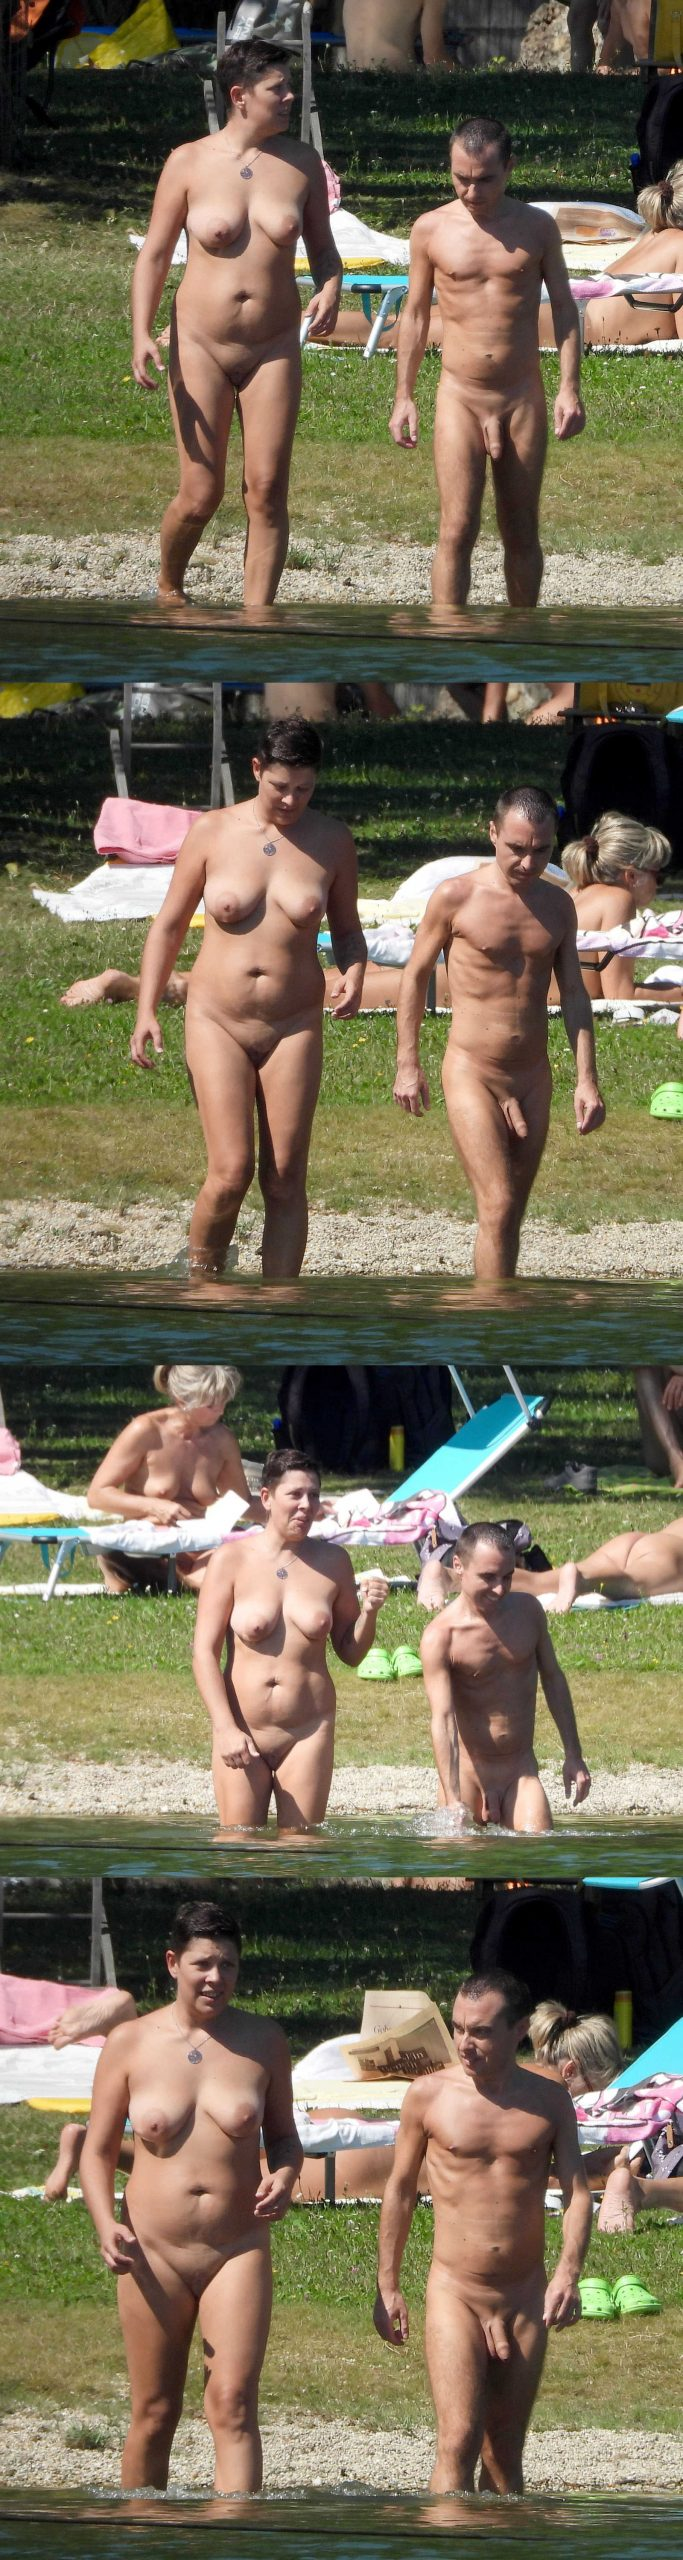 hung married nudist man caught by hidden camera